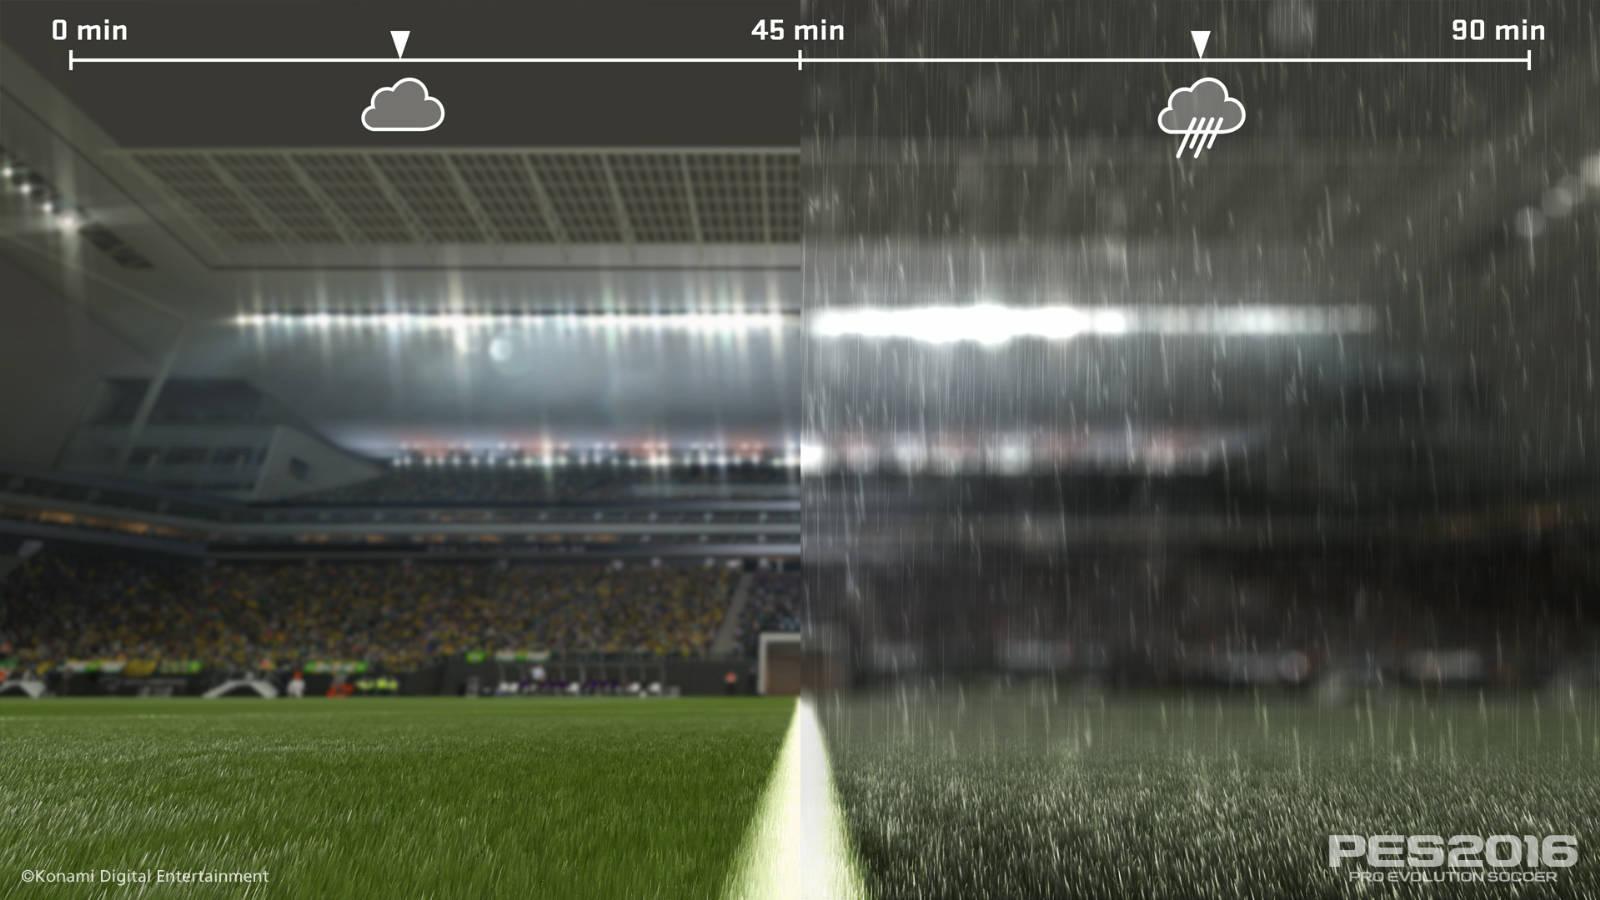 pes-2016-weather-2.jpg